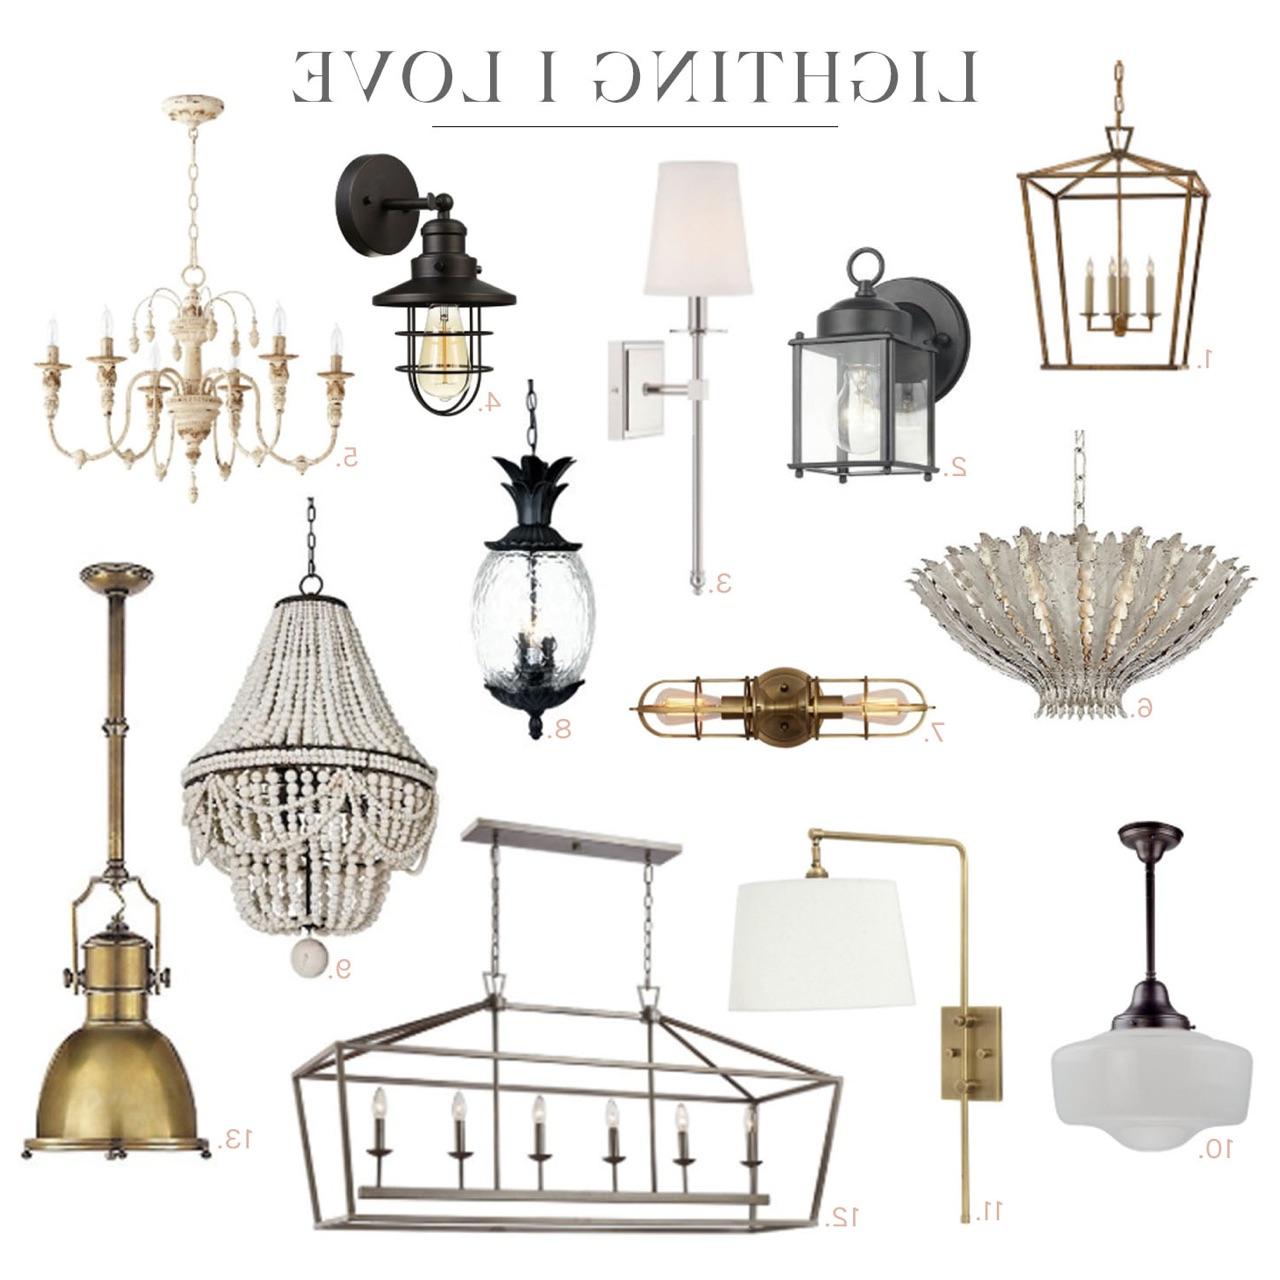 In My Home: Lighting I Love Regarding Current Carmen 6 Light Kitchen Island Linear Pendants (Gallery 18 of 25)